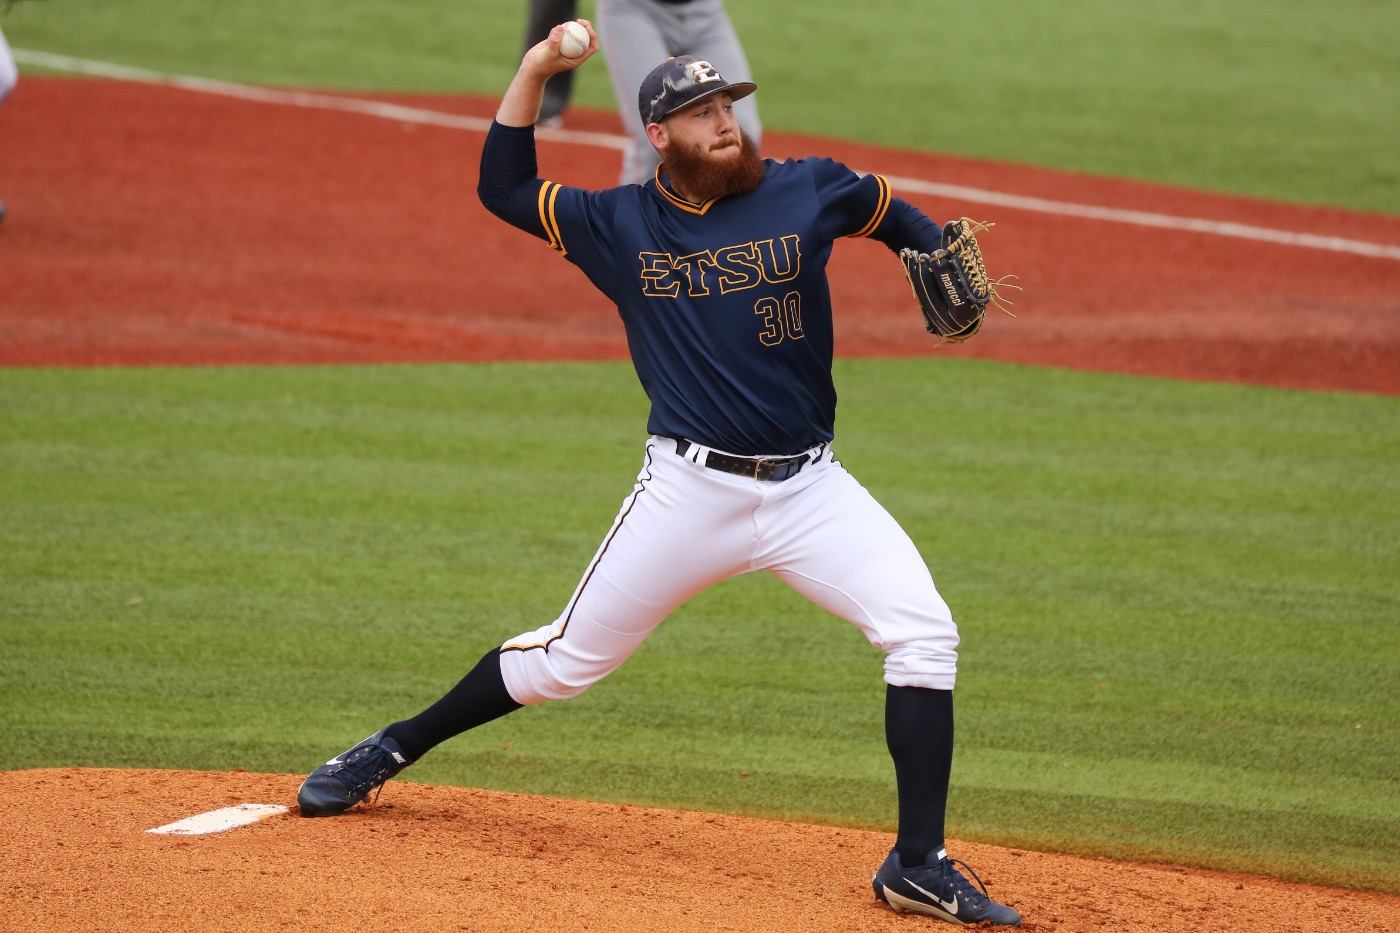 Baseball splits road double-header with UNCG